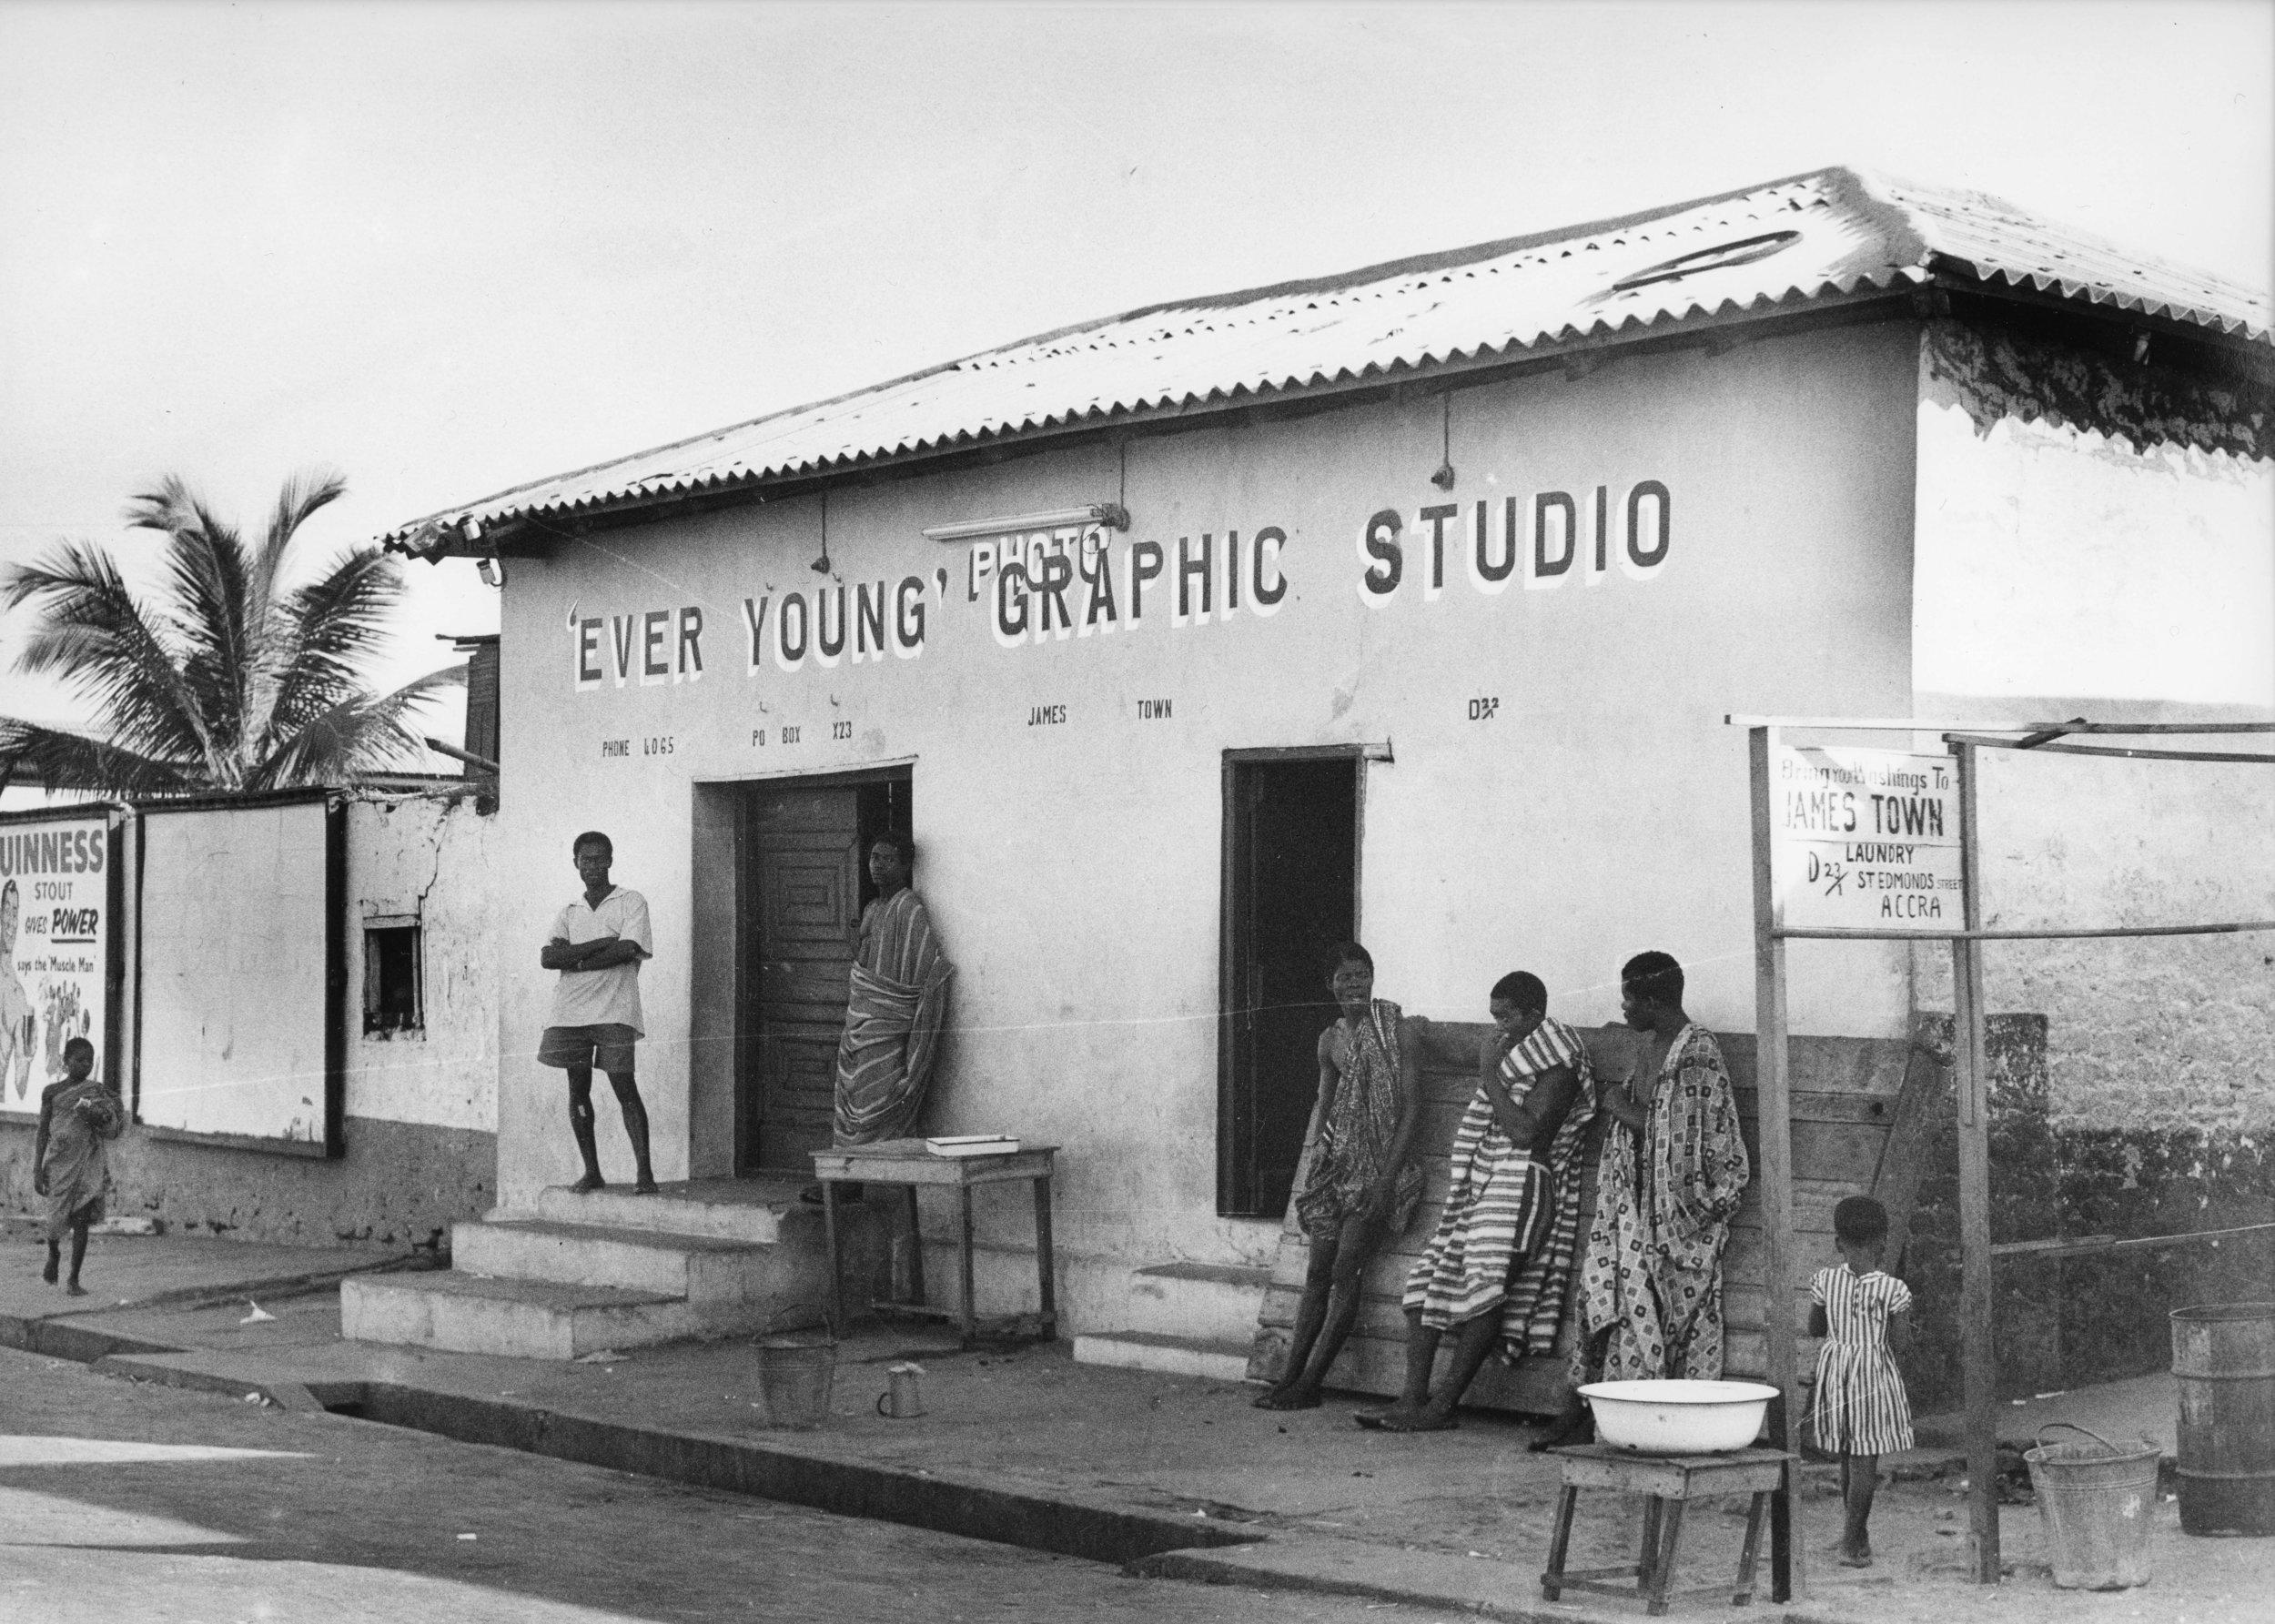 Life According to James Barnor - Photographs of Ghana and the United Kingdom, 1948-1980